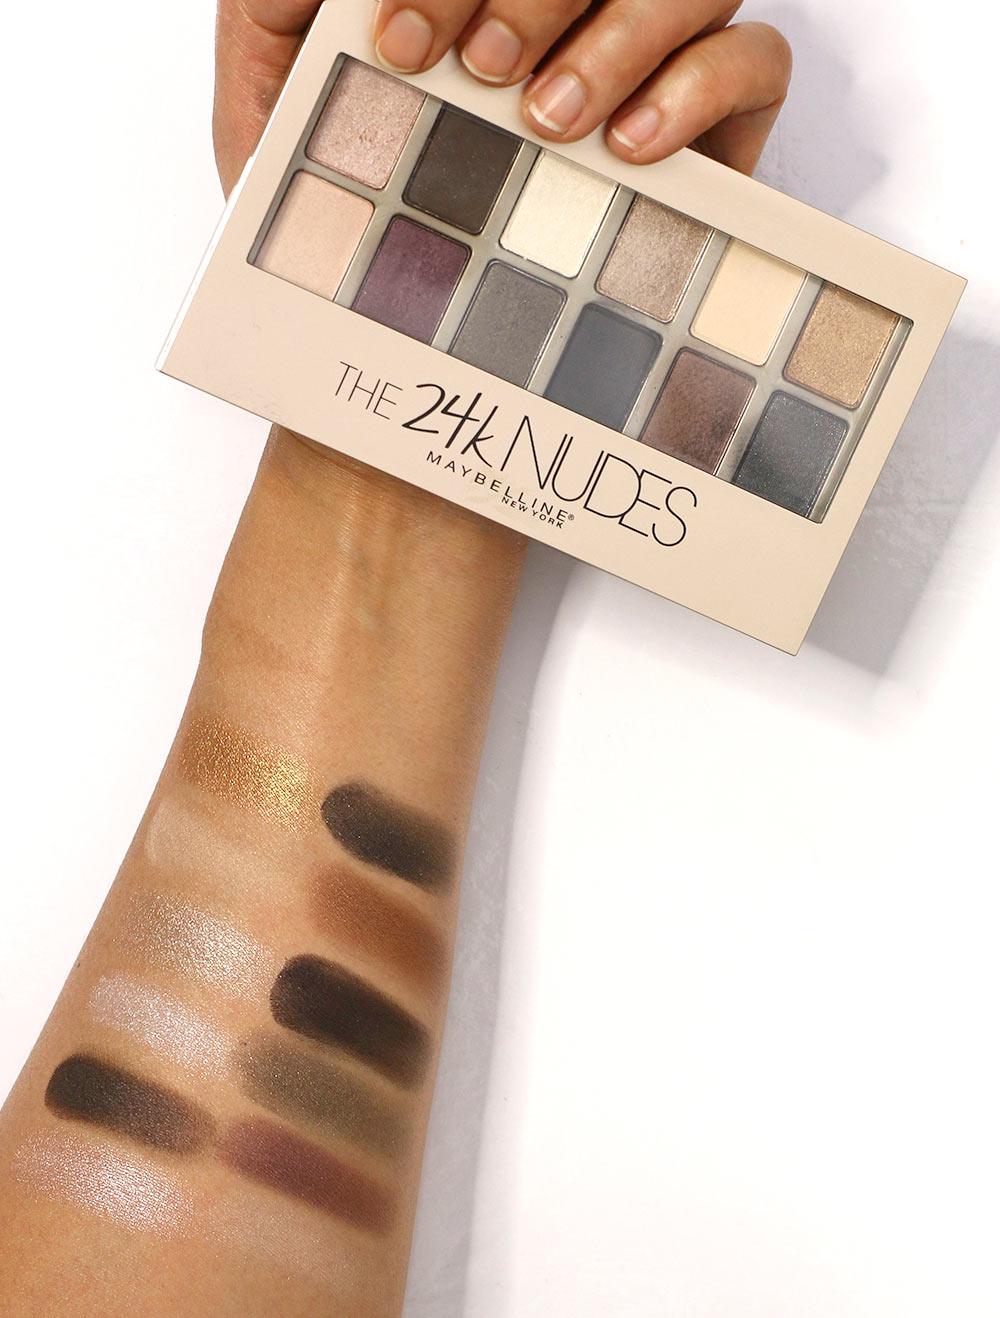 maybelline the 24karat nudes palette swatches